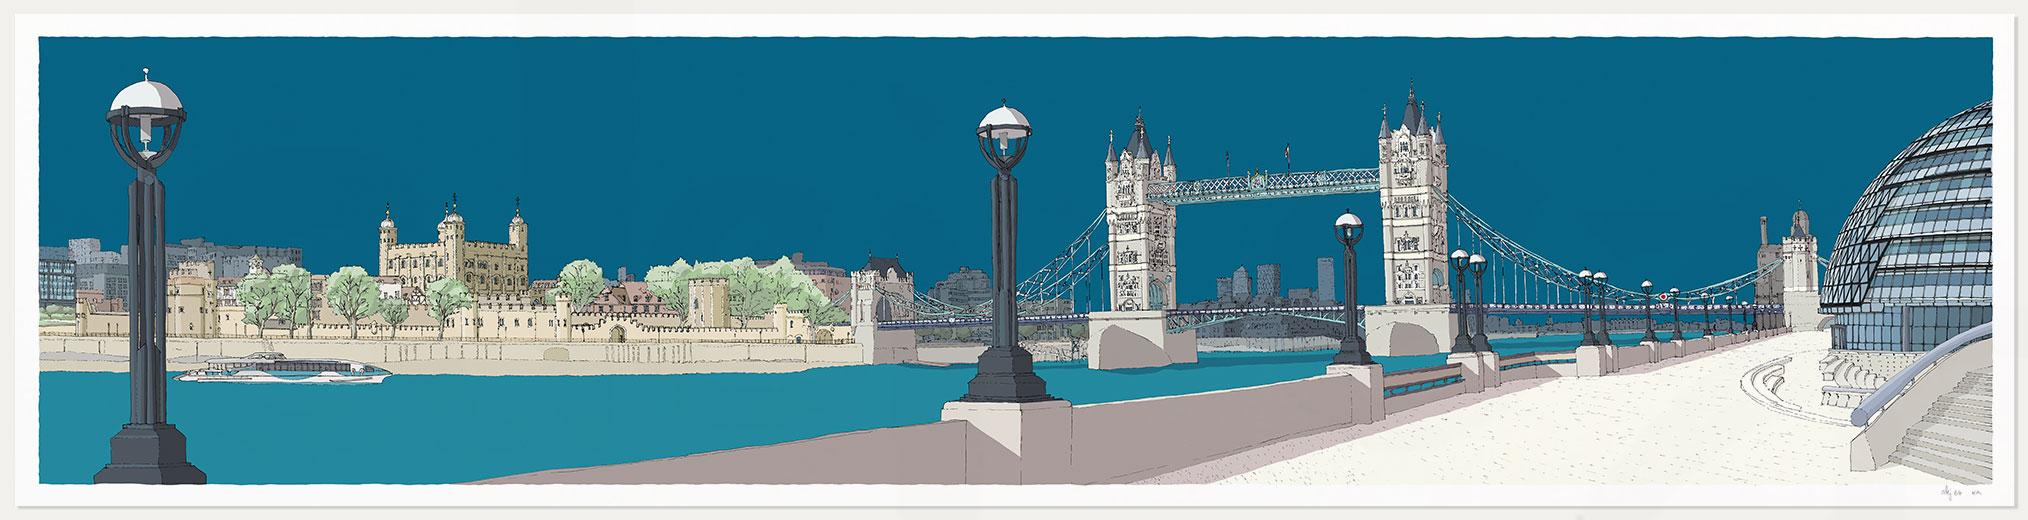 print named London River Thames by Tower Bridge Ocean Blue by artist alej ez